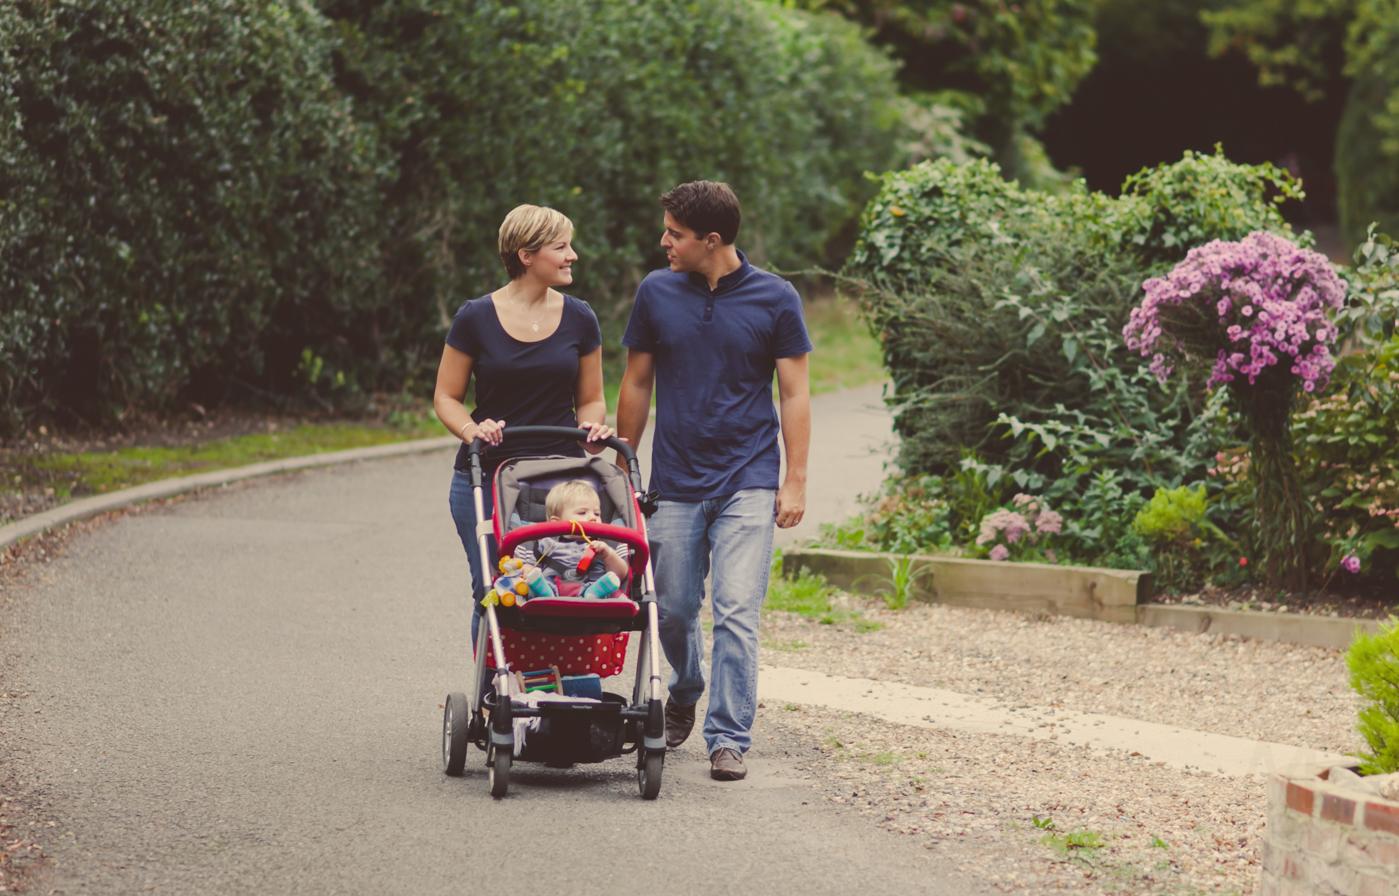 012 - Kelly, Matthew and Hugo Fine Art Family Photography by www.mpmedia.co.uk -73.JPG